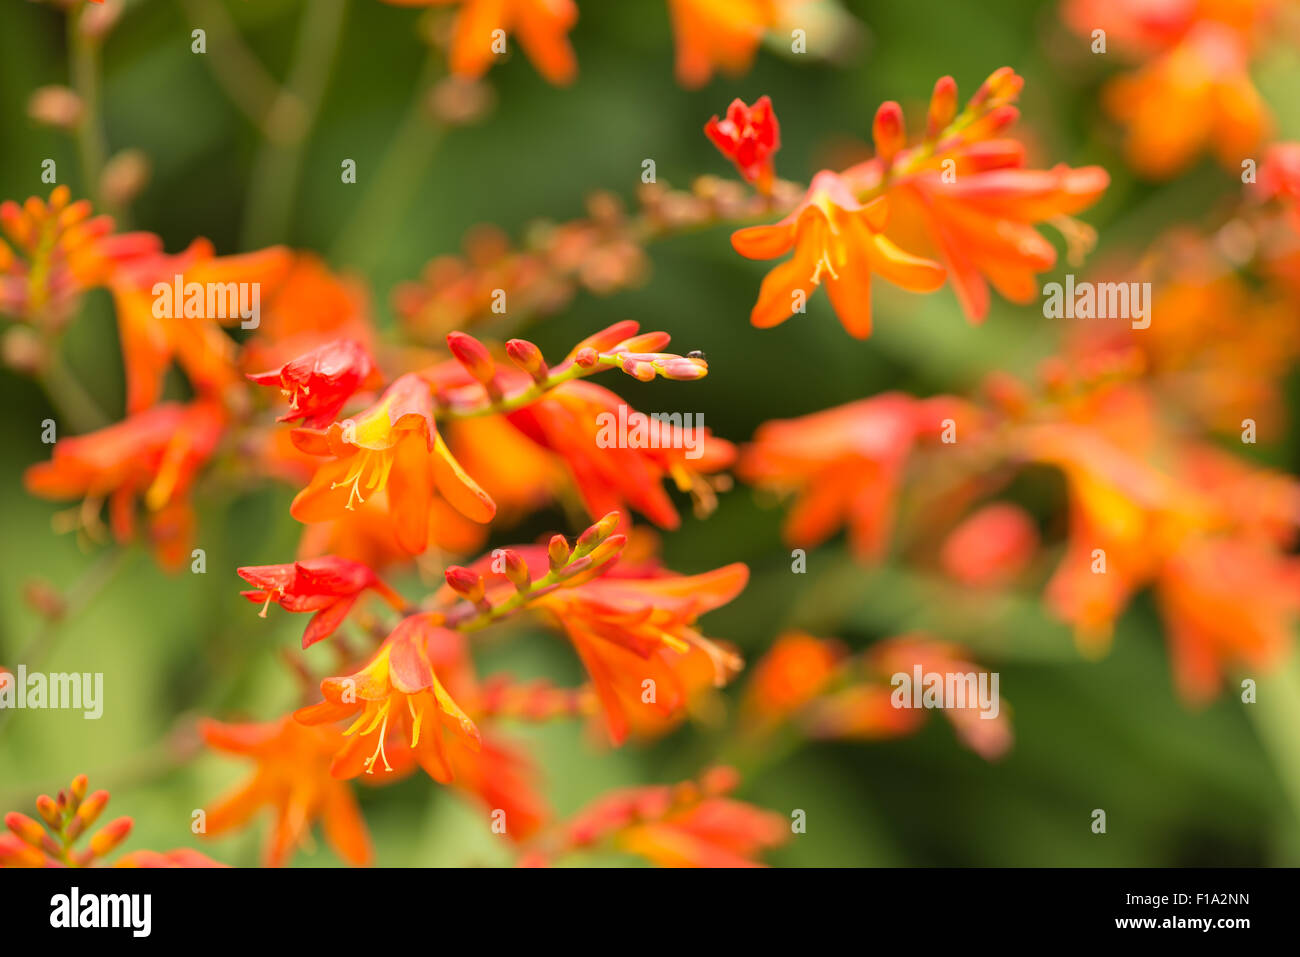 Crocosmia genus Iridaceae coppertips falling stars montbretia bright orange flowers against green slender blade Stock Photo